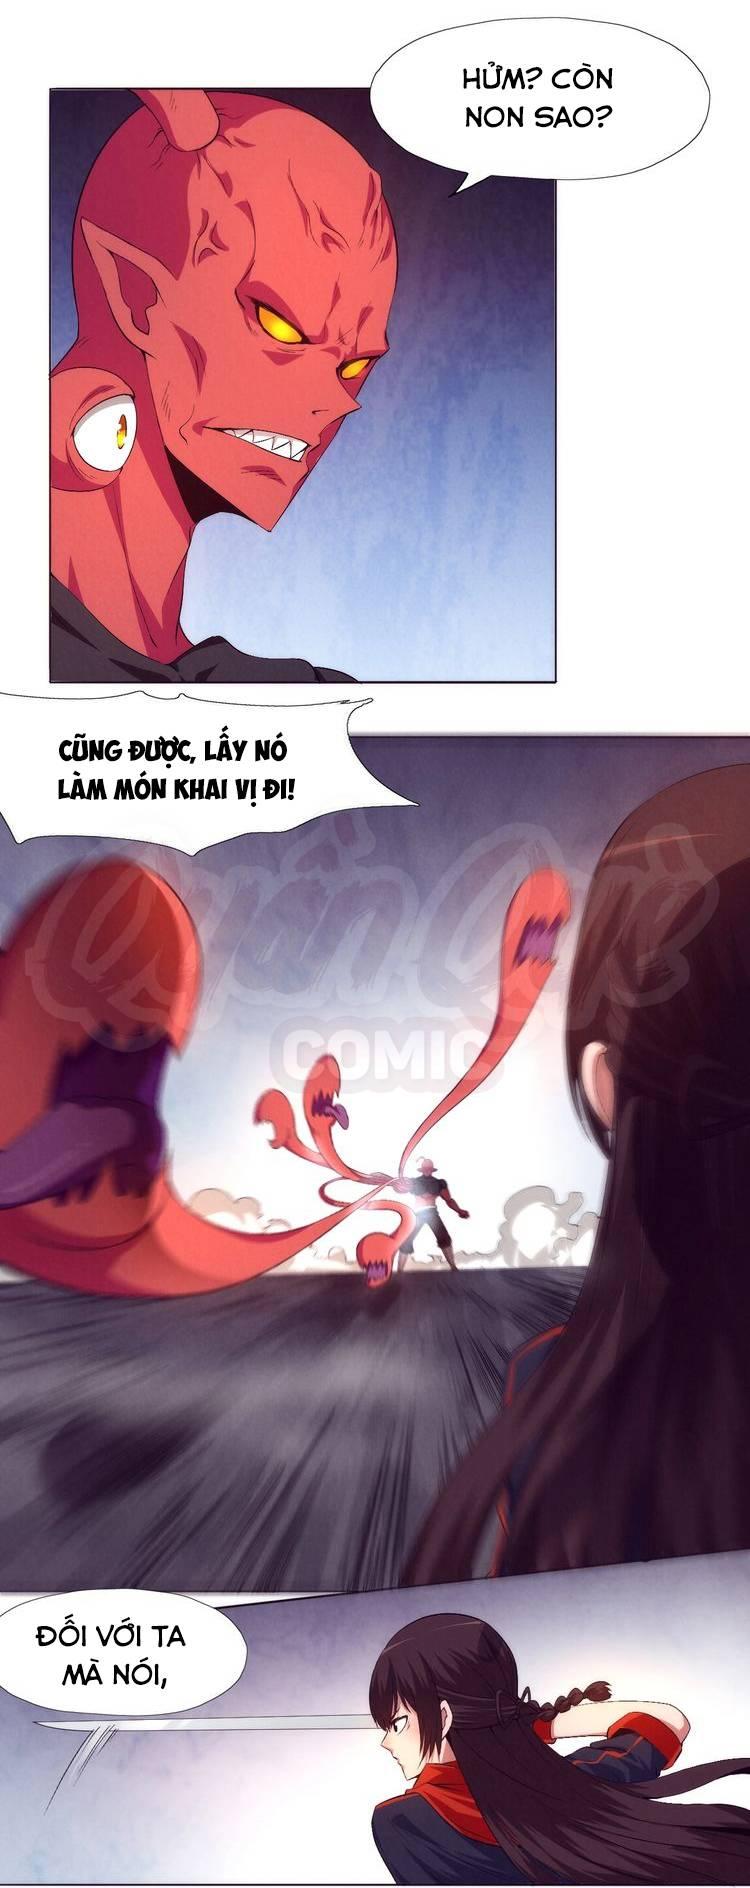 Hắc Kim Đảo chapter 26 - Hamtruyen.vn